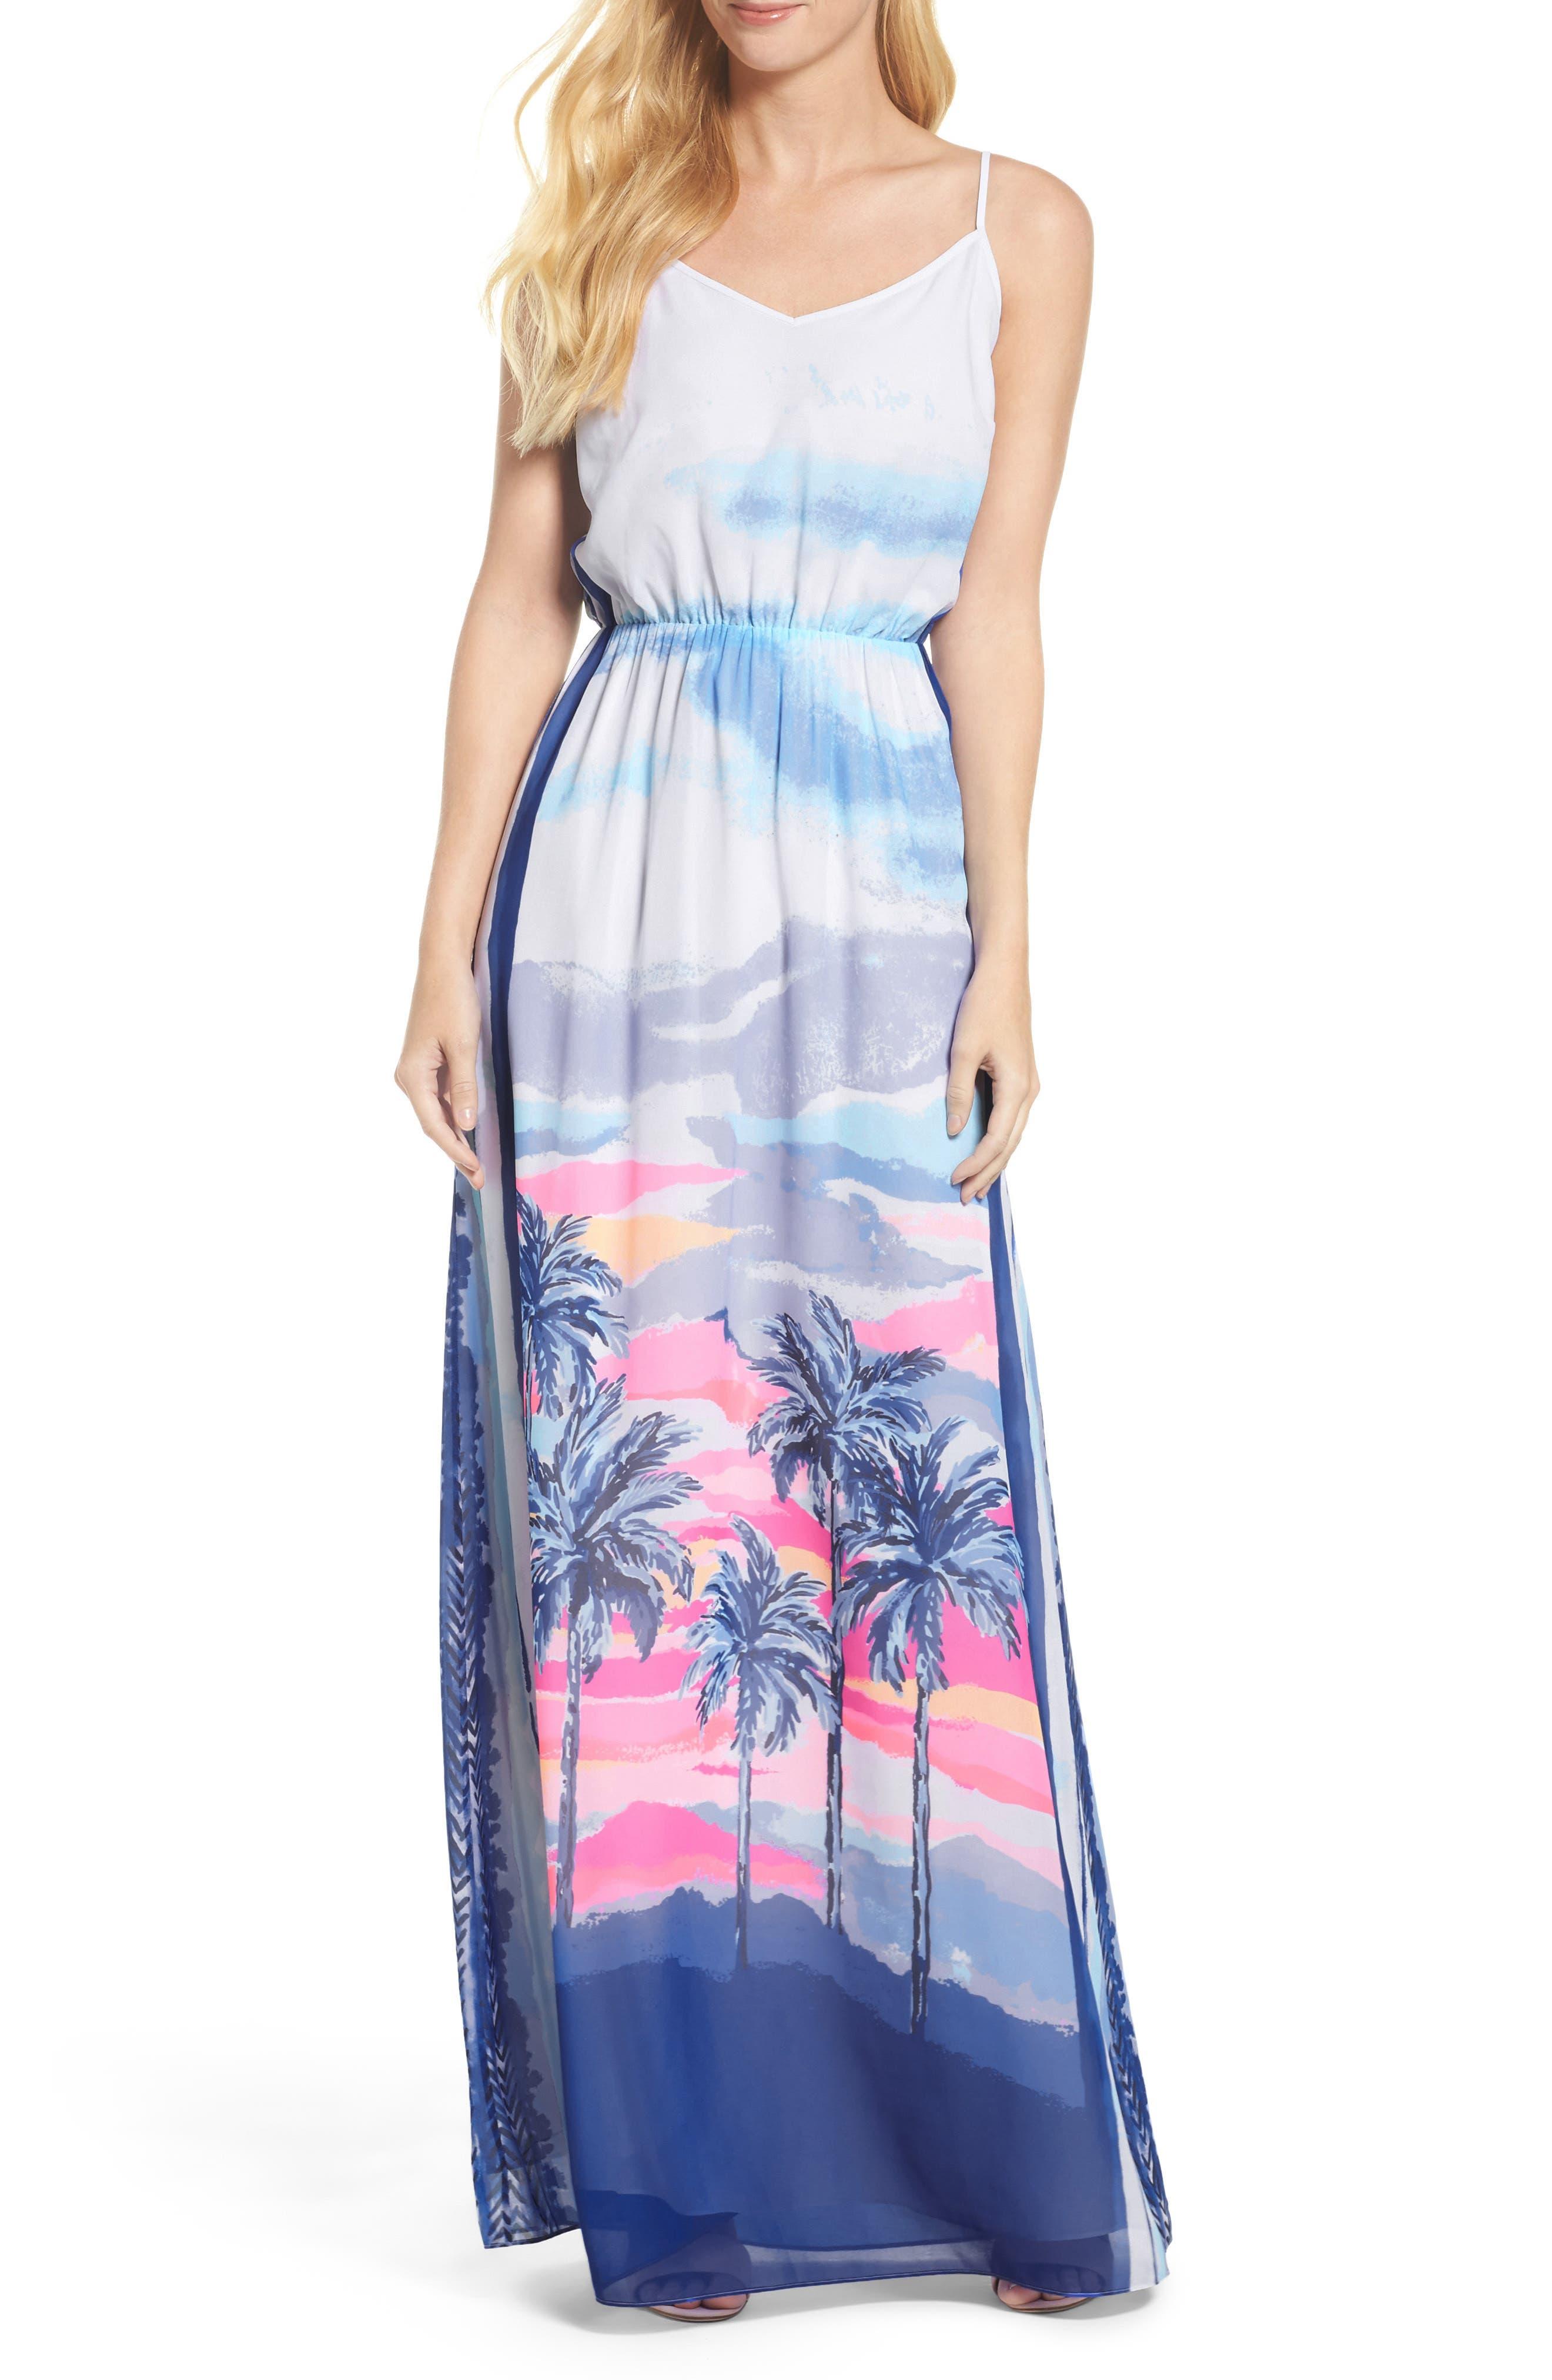 Main Image - Lilly Pulitzer® Deanna Maxi Dress